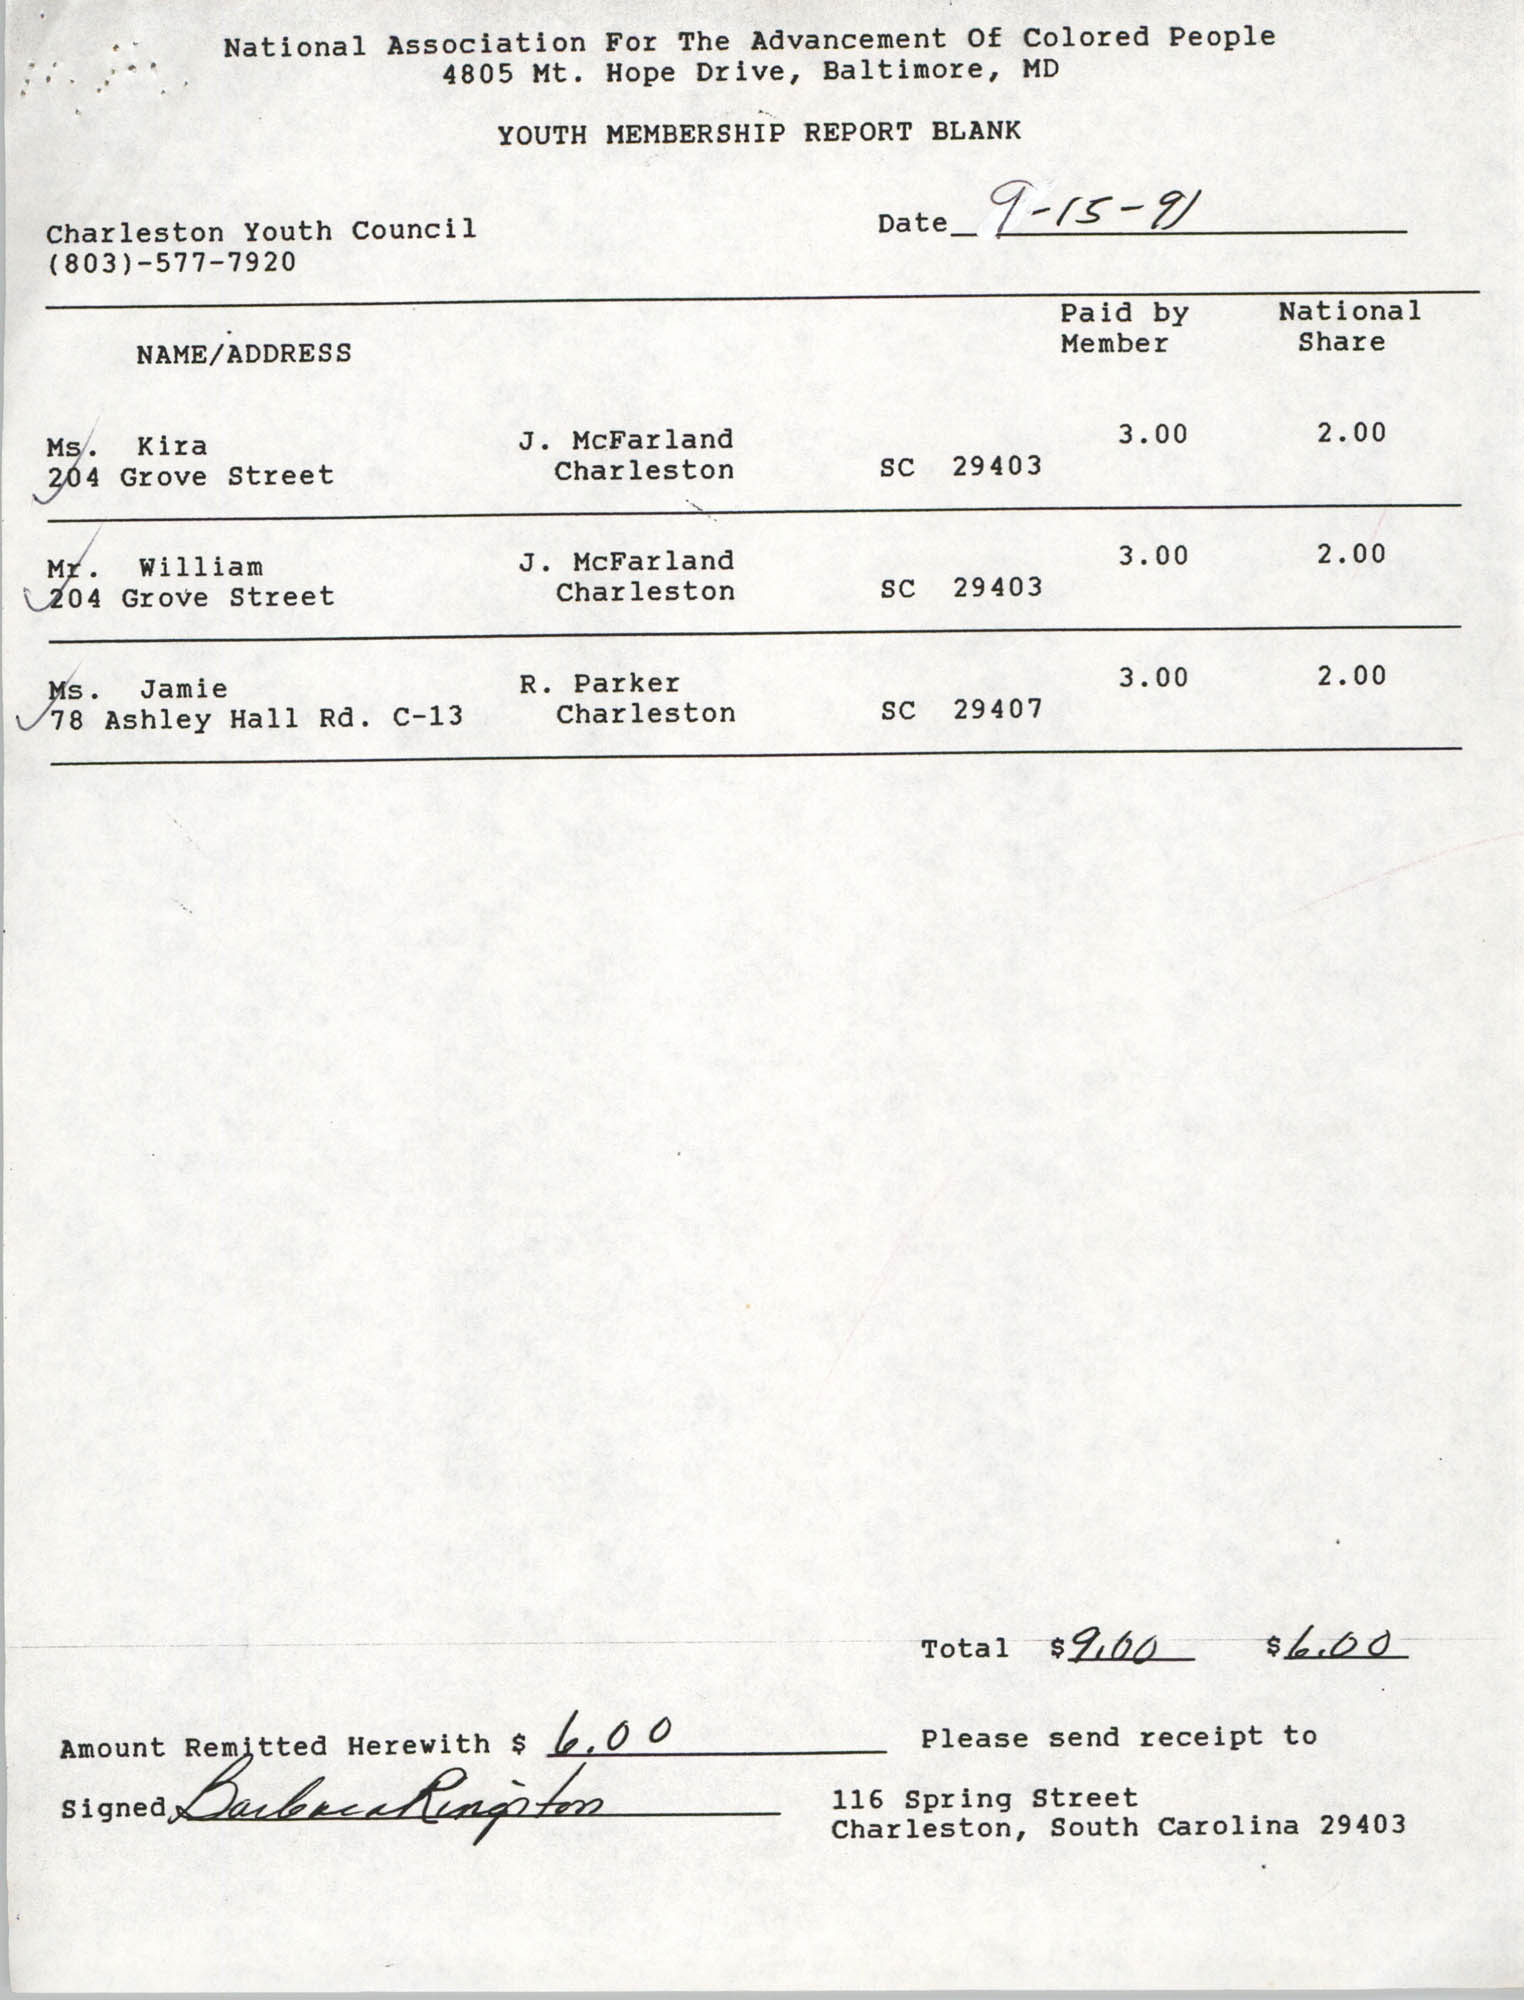 Youth Membership Report Blank, Charleston Youth Council, NAACP, Barbara Kingston, September 31, 1991